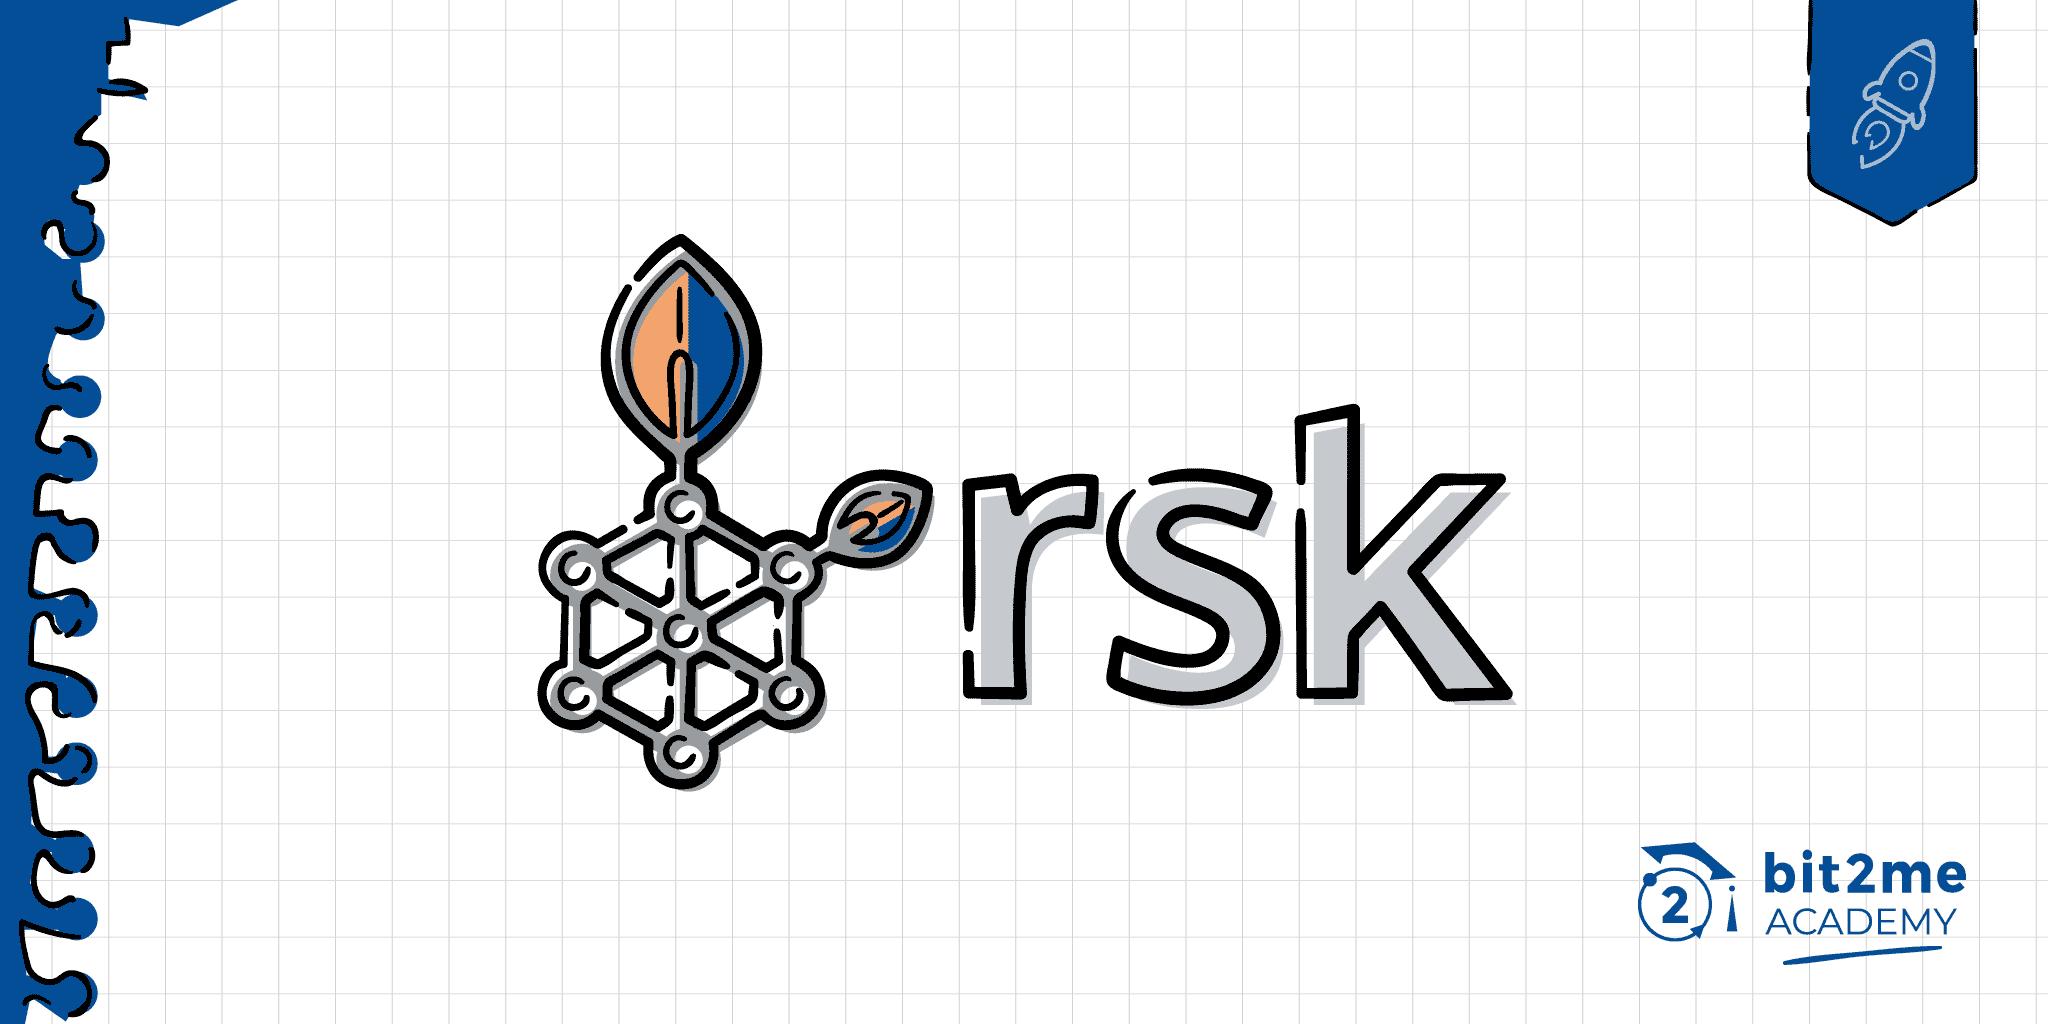 what is rootstock, what is rsk, what is rsk bitcoin